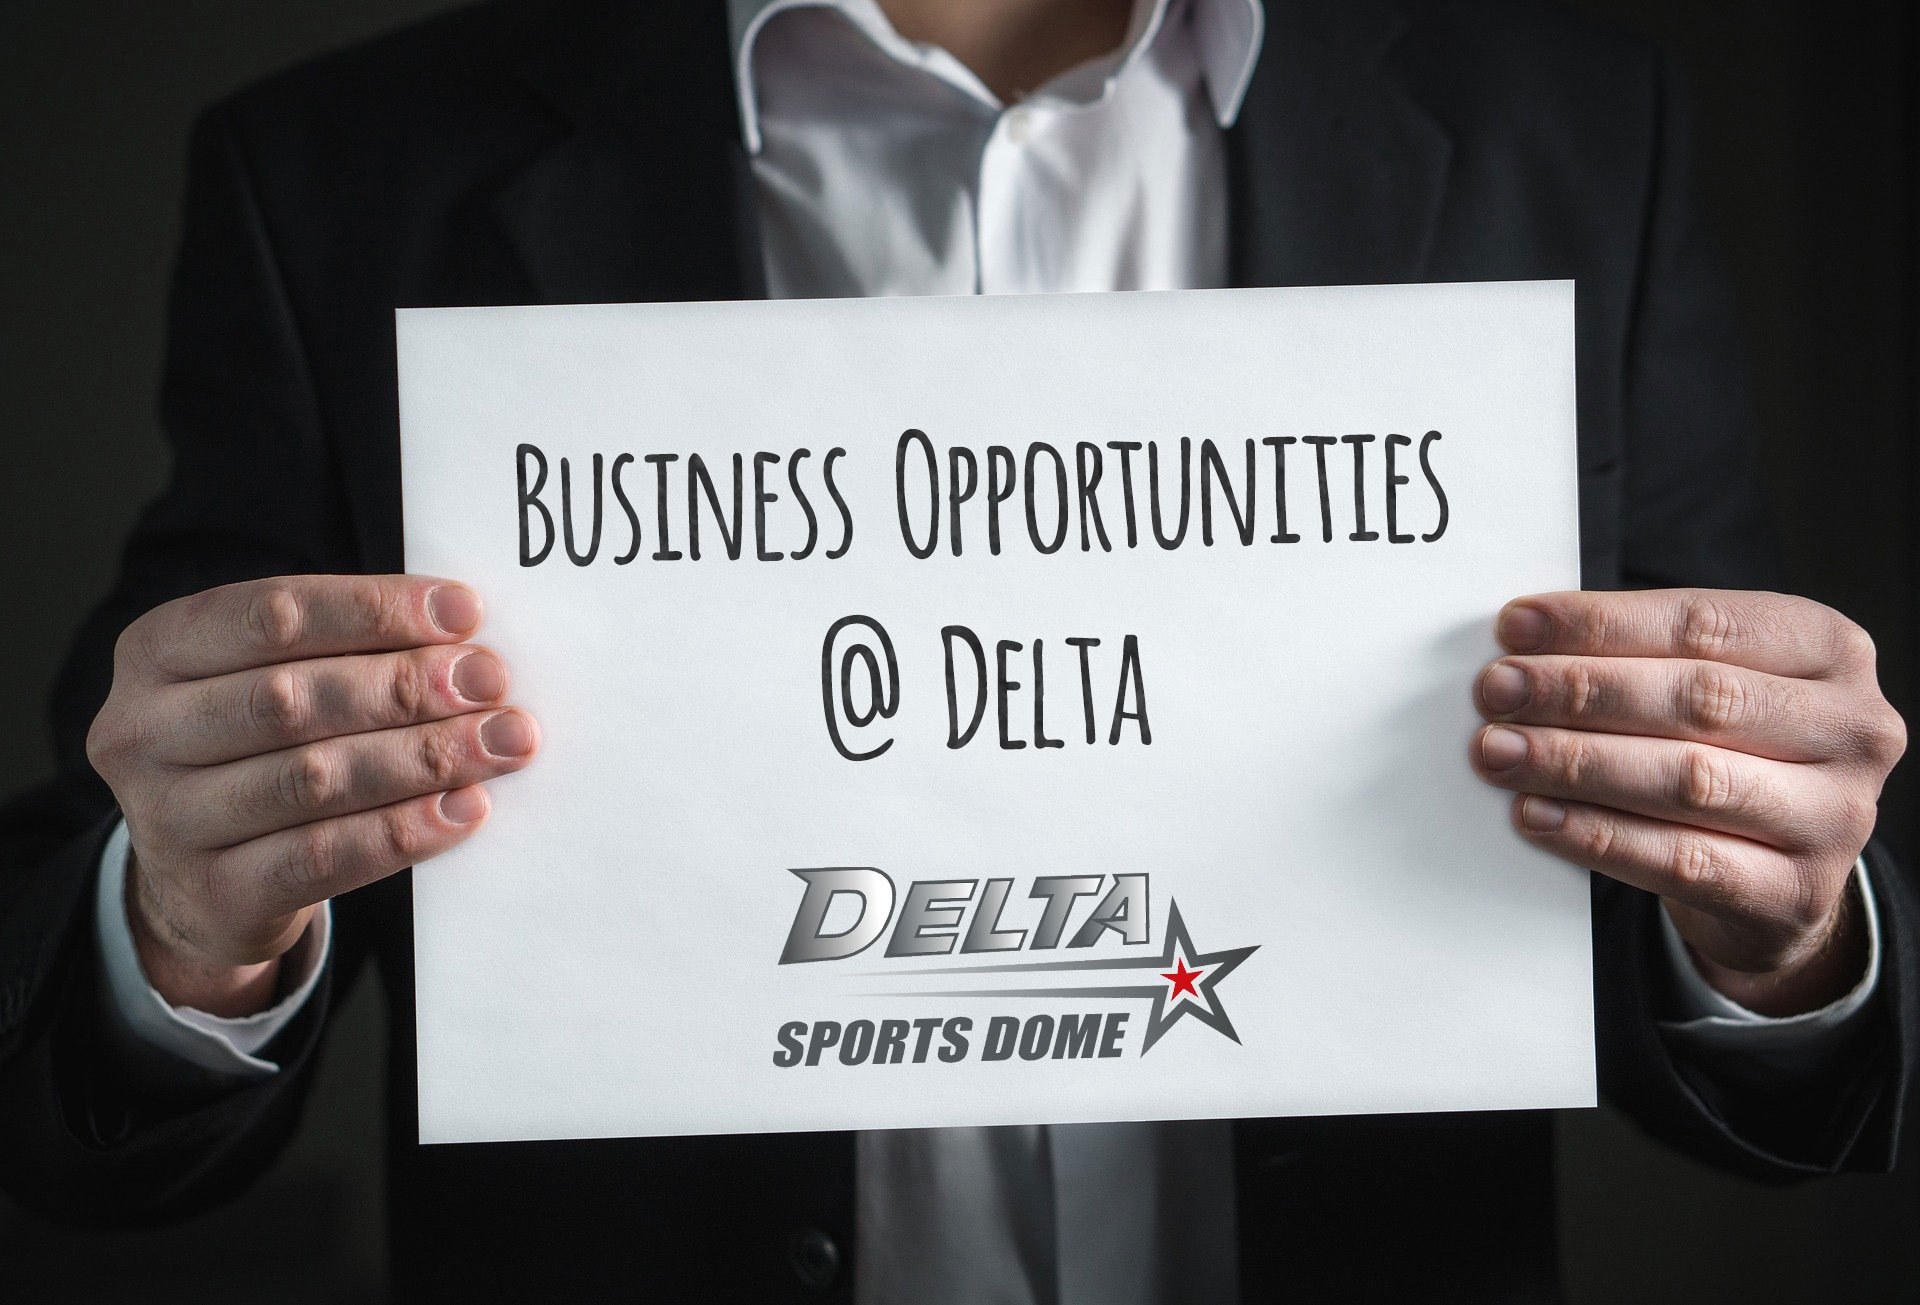 Business Opportunities @ Delta